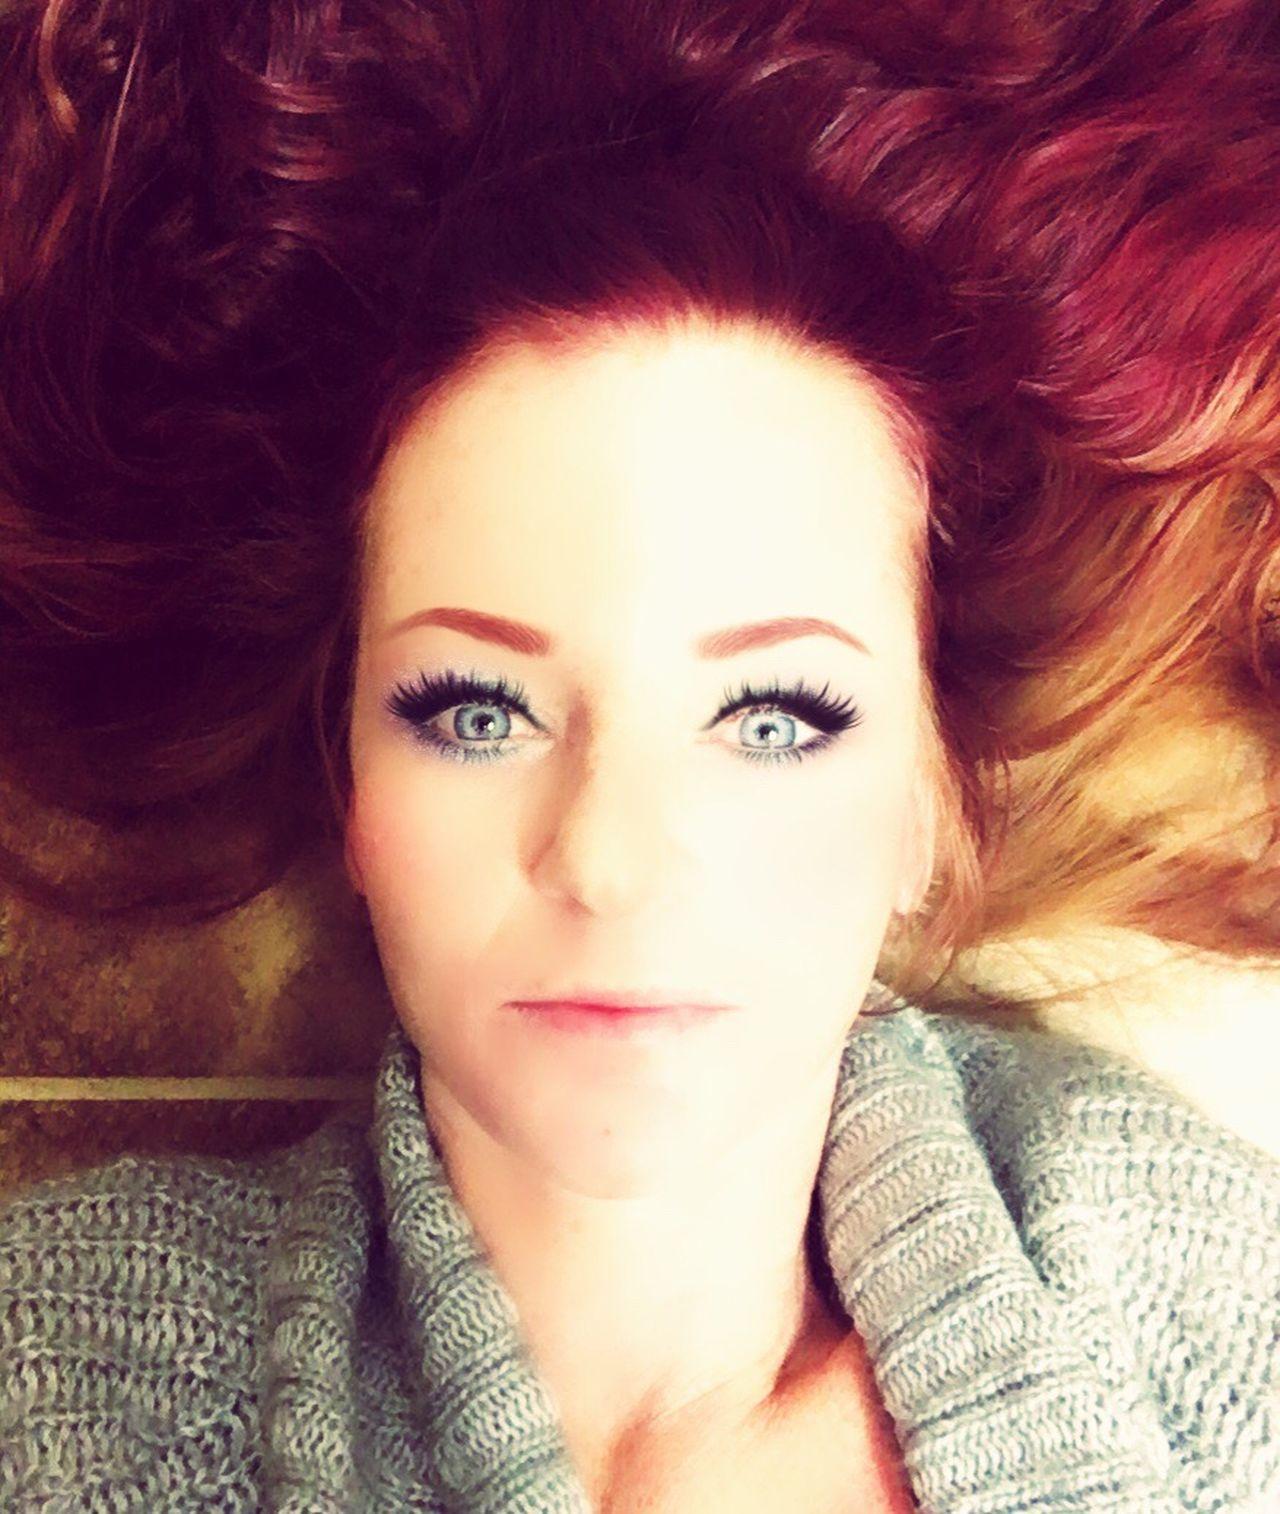 Redheads  Redheadsdoitbest Gingersofinstagram Ginger Irish Irish Girl Woman Of EyeEm Eyes Blue Eyes BlueEyes Red Heads :) Beautiful Woman Close Up Portrait Only Women Beauty Beautiful People Headshot Make-up Close-up Redhair Erotic_model SexyAsFuck